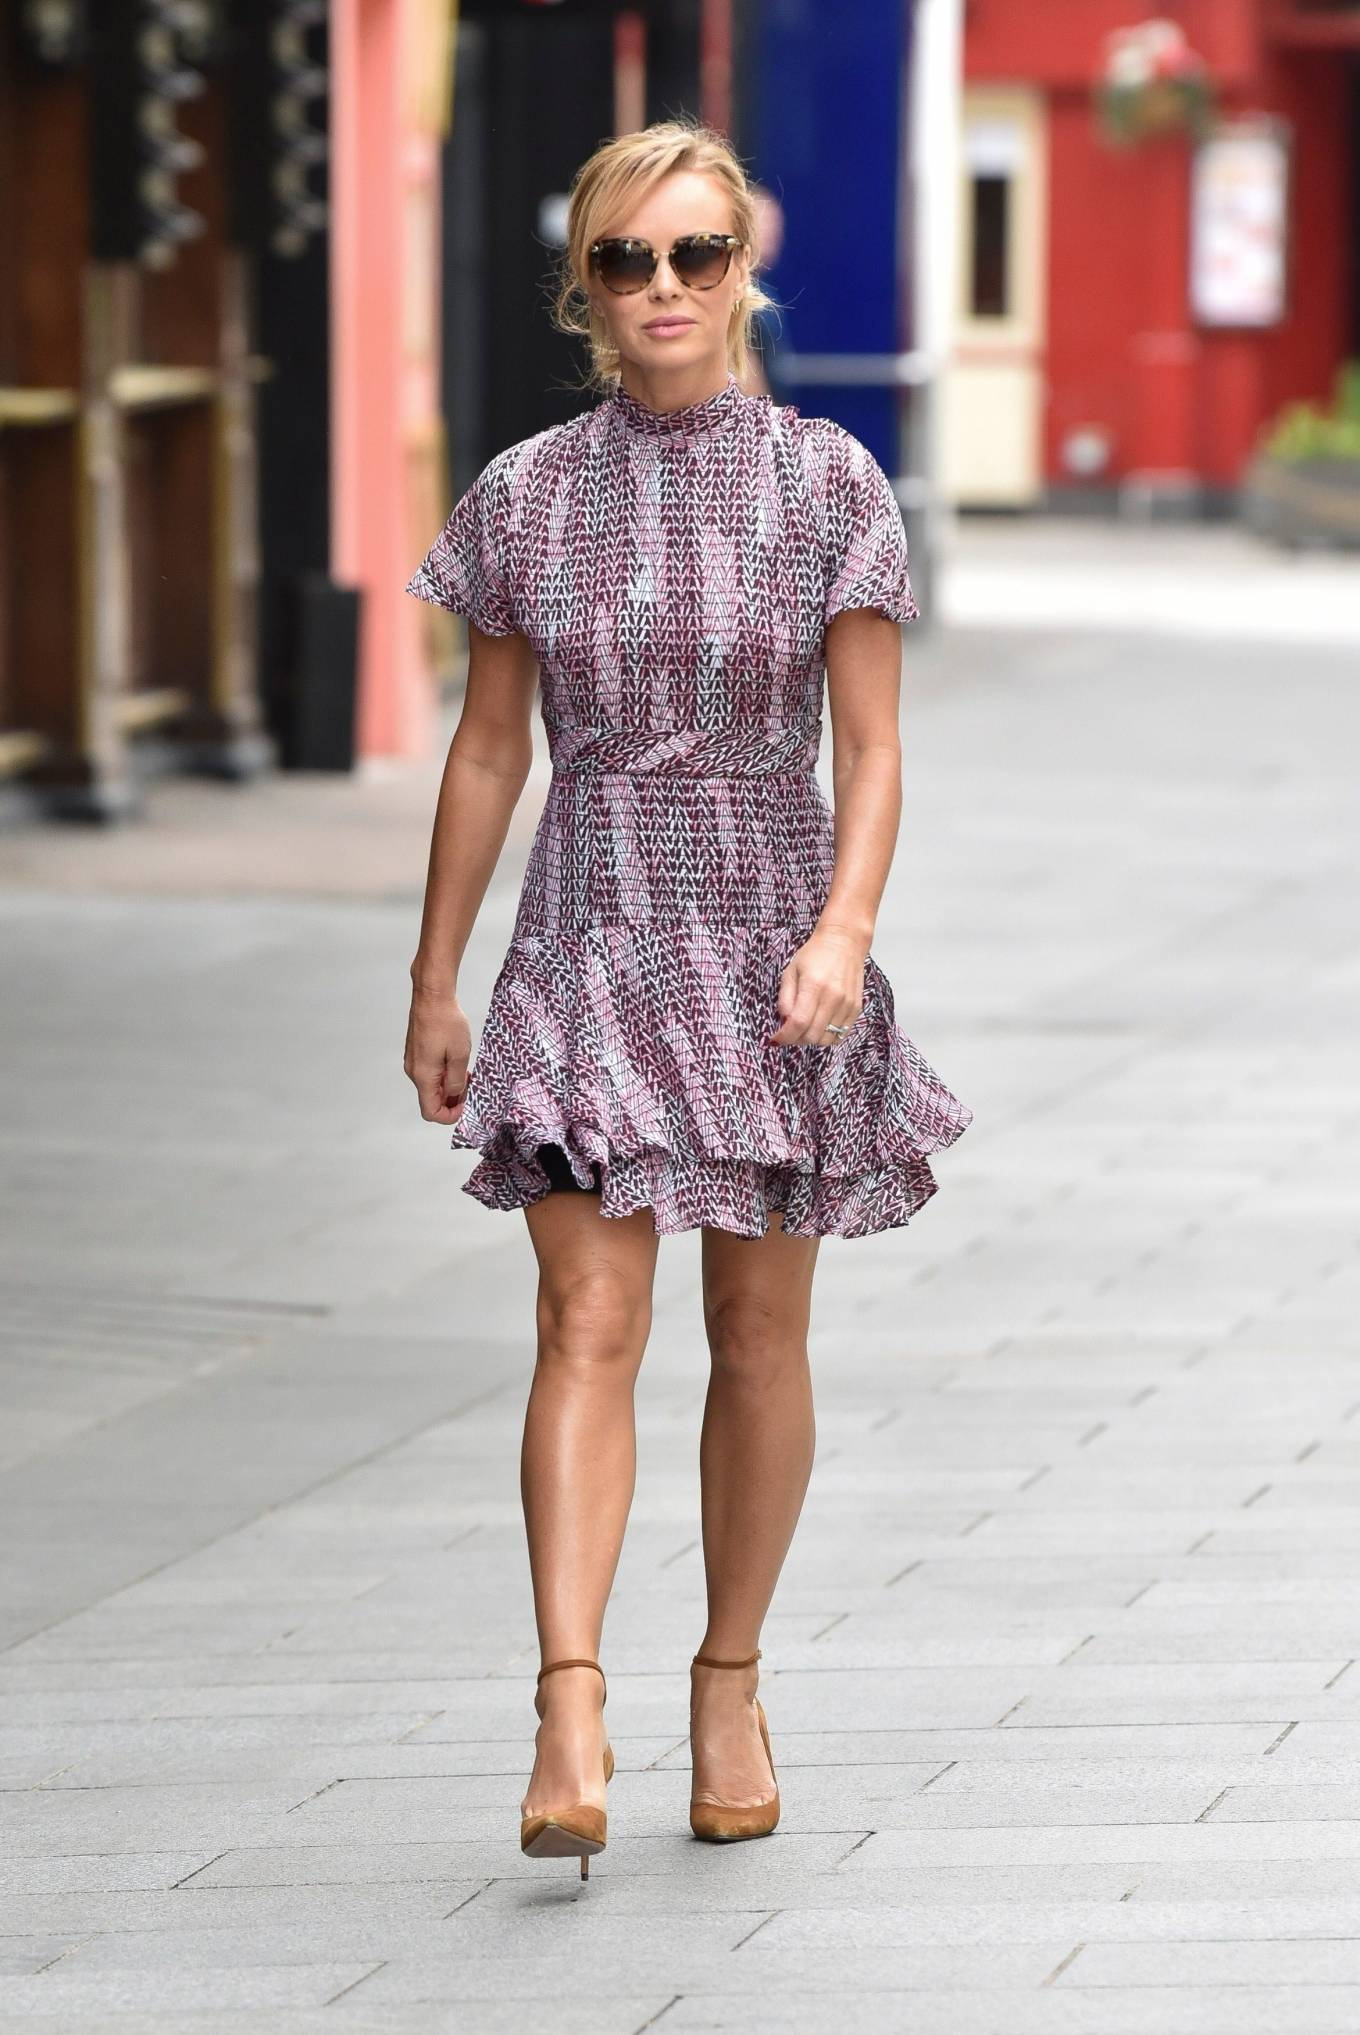 Amanda Holden 2020 : Amanda Holden – In a layered ruffle mini dress at Heart Radio Studios in London -04